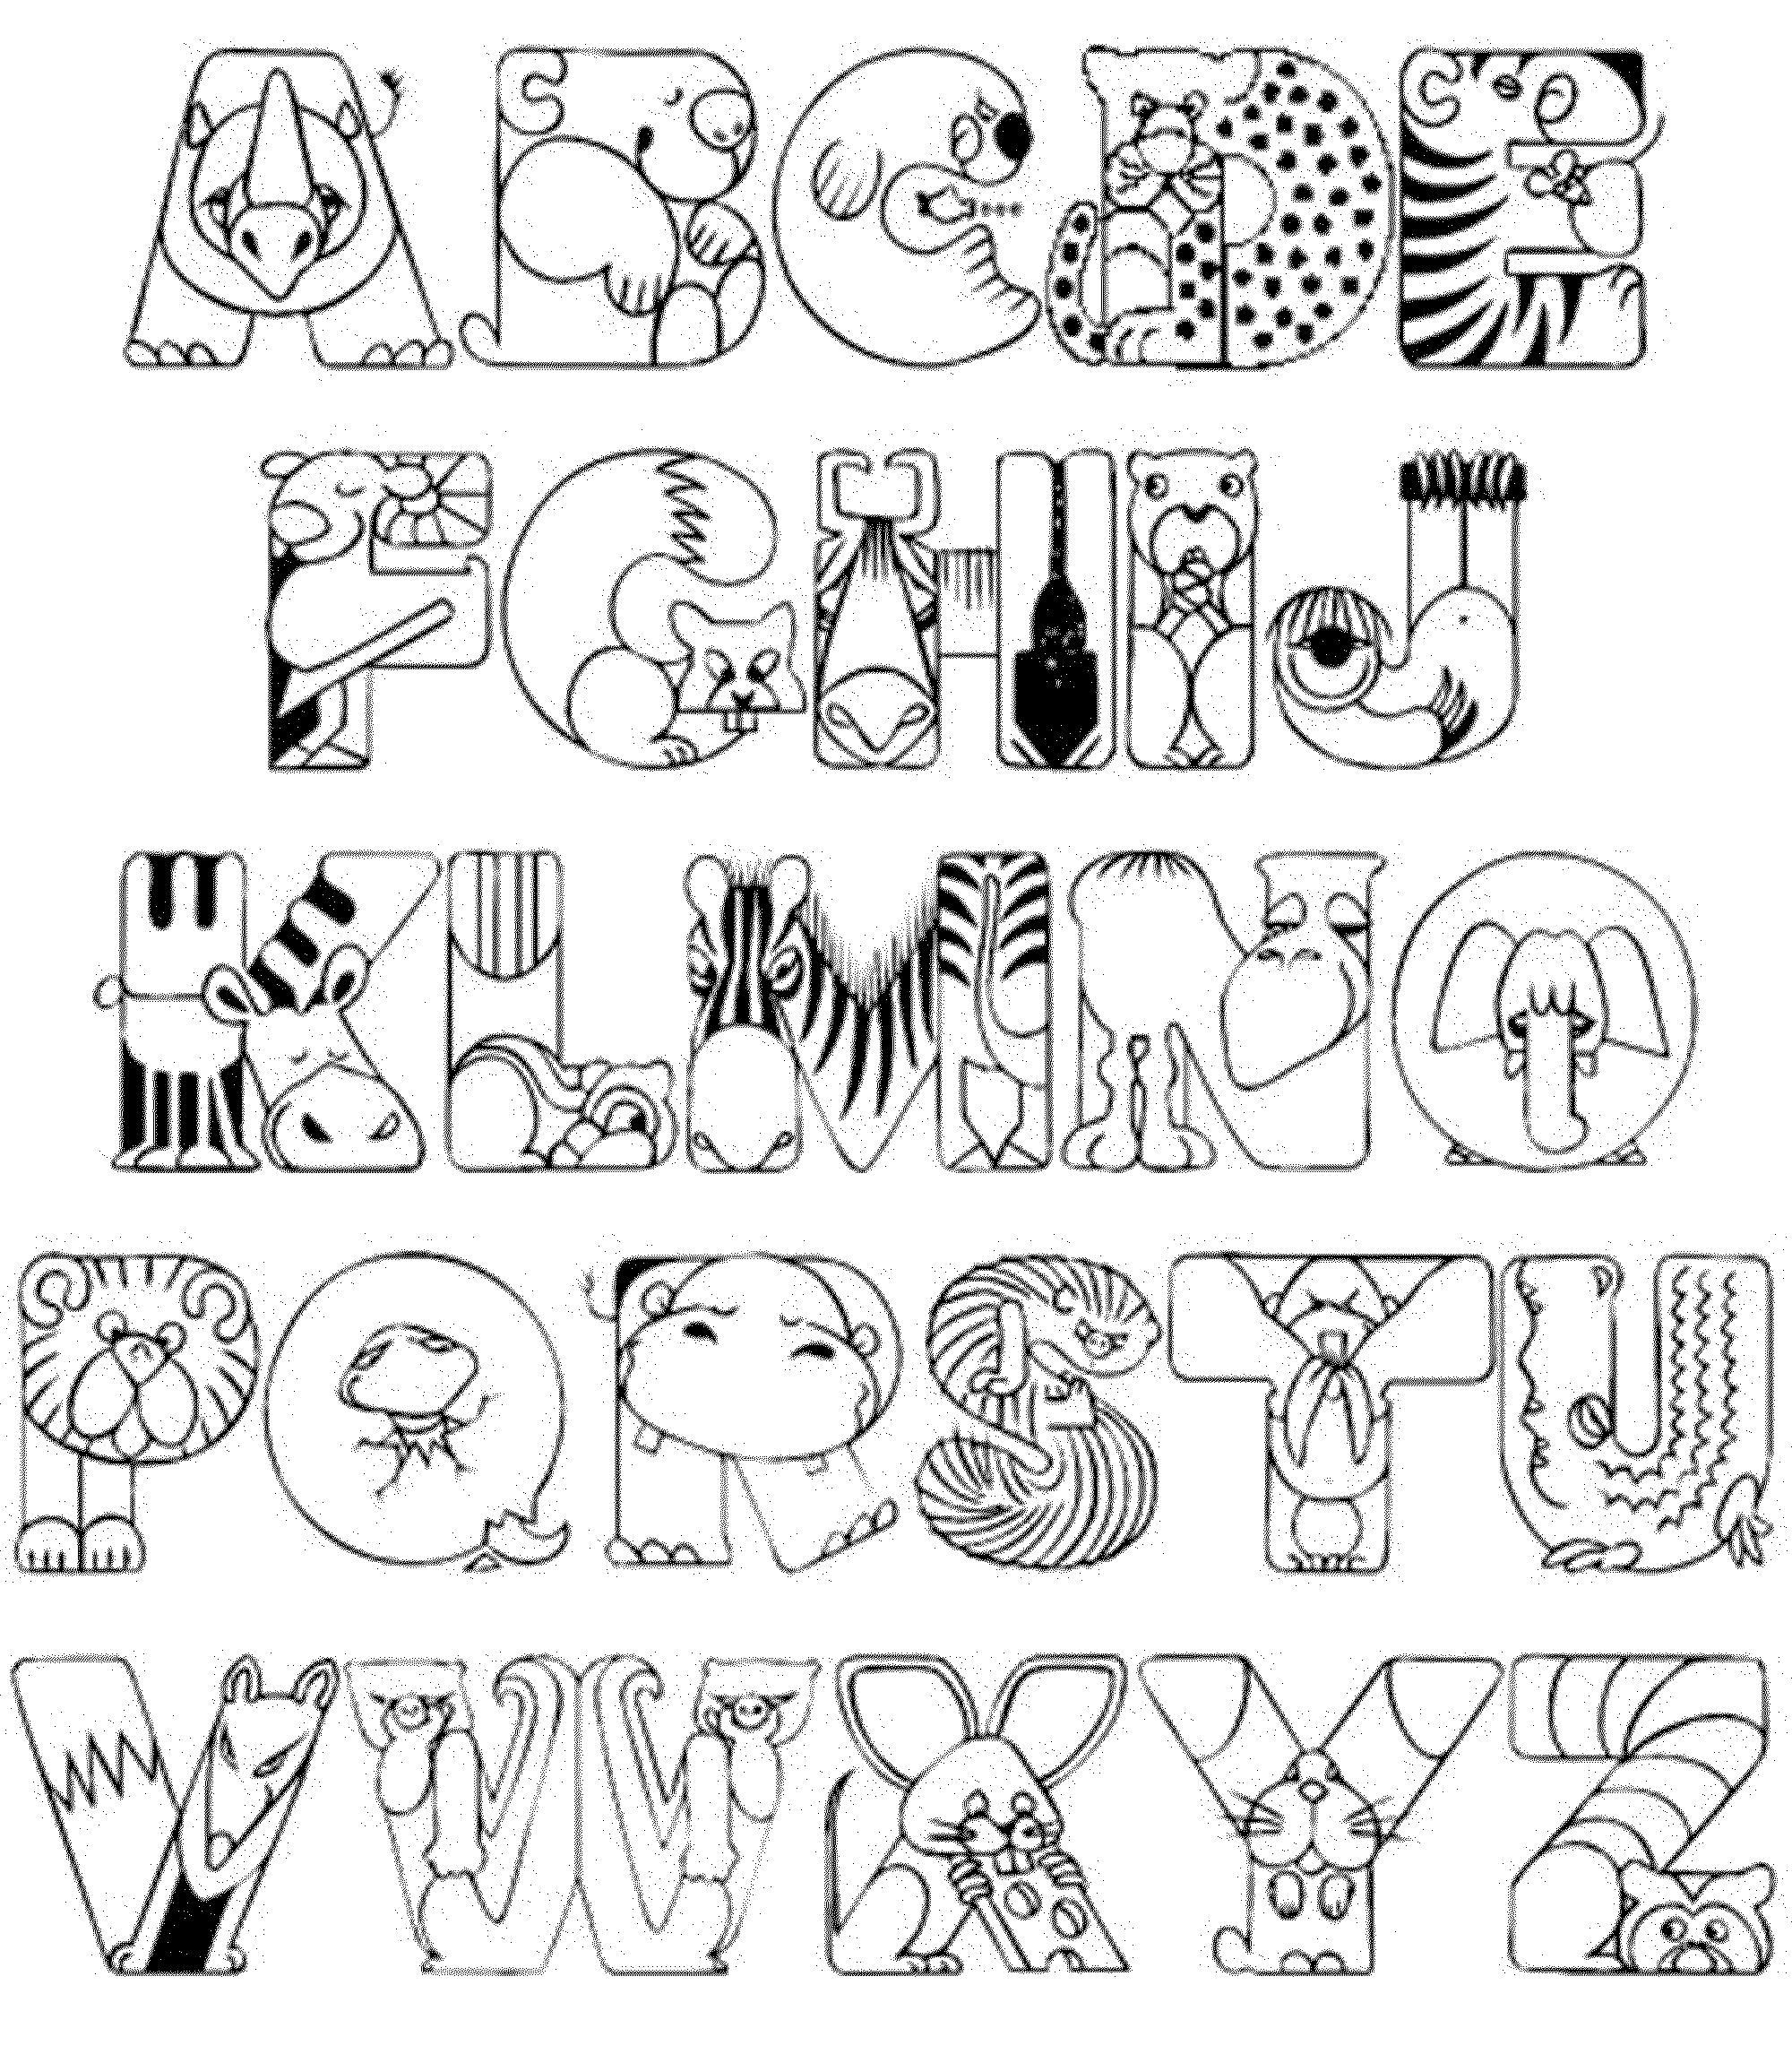 abc coloring book download letter g alphabet coloring pages 3 free printable book abc coloring download